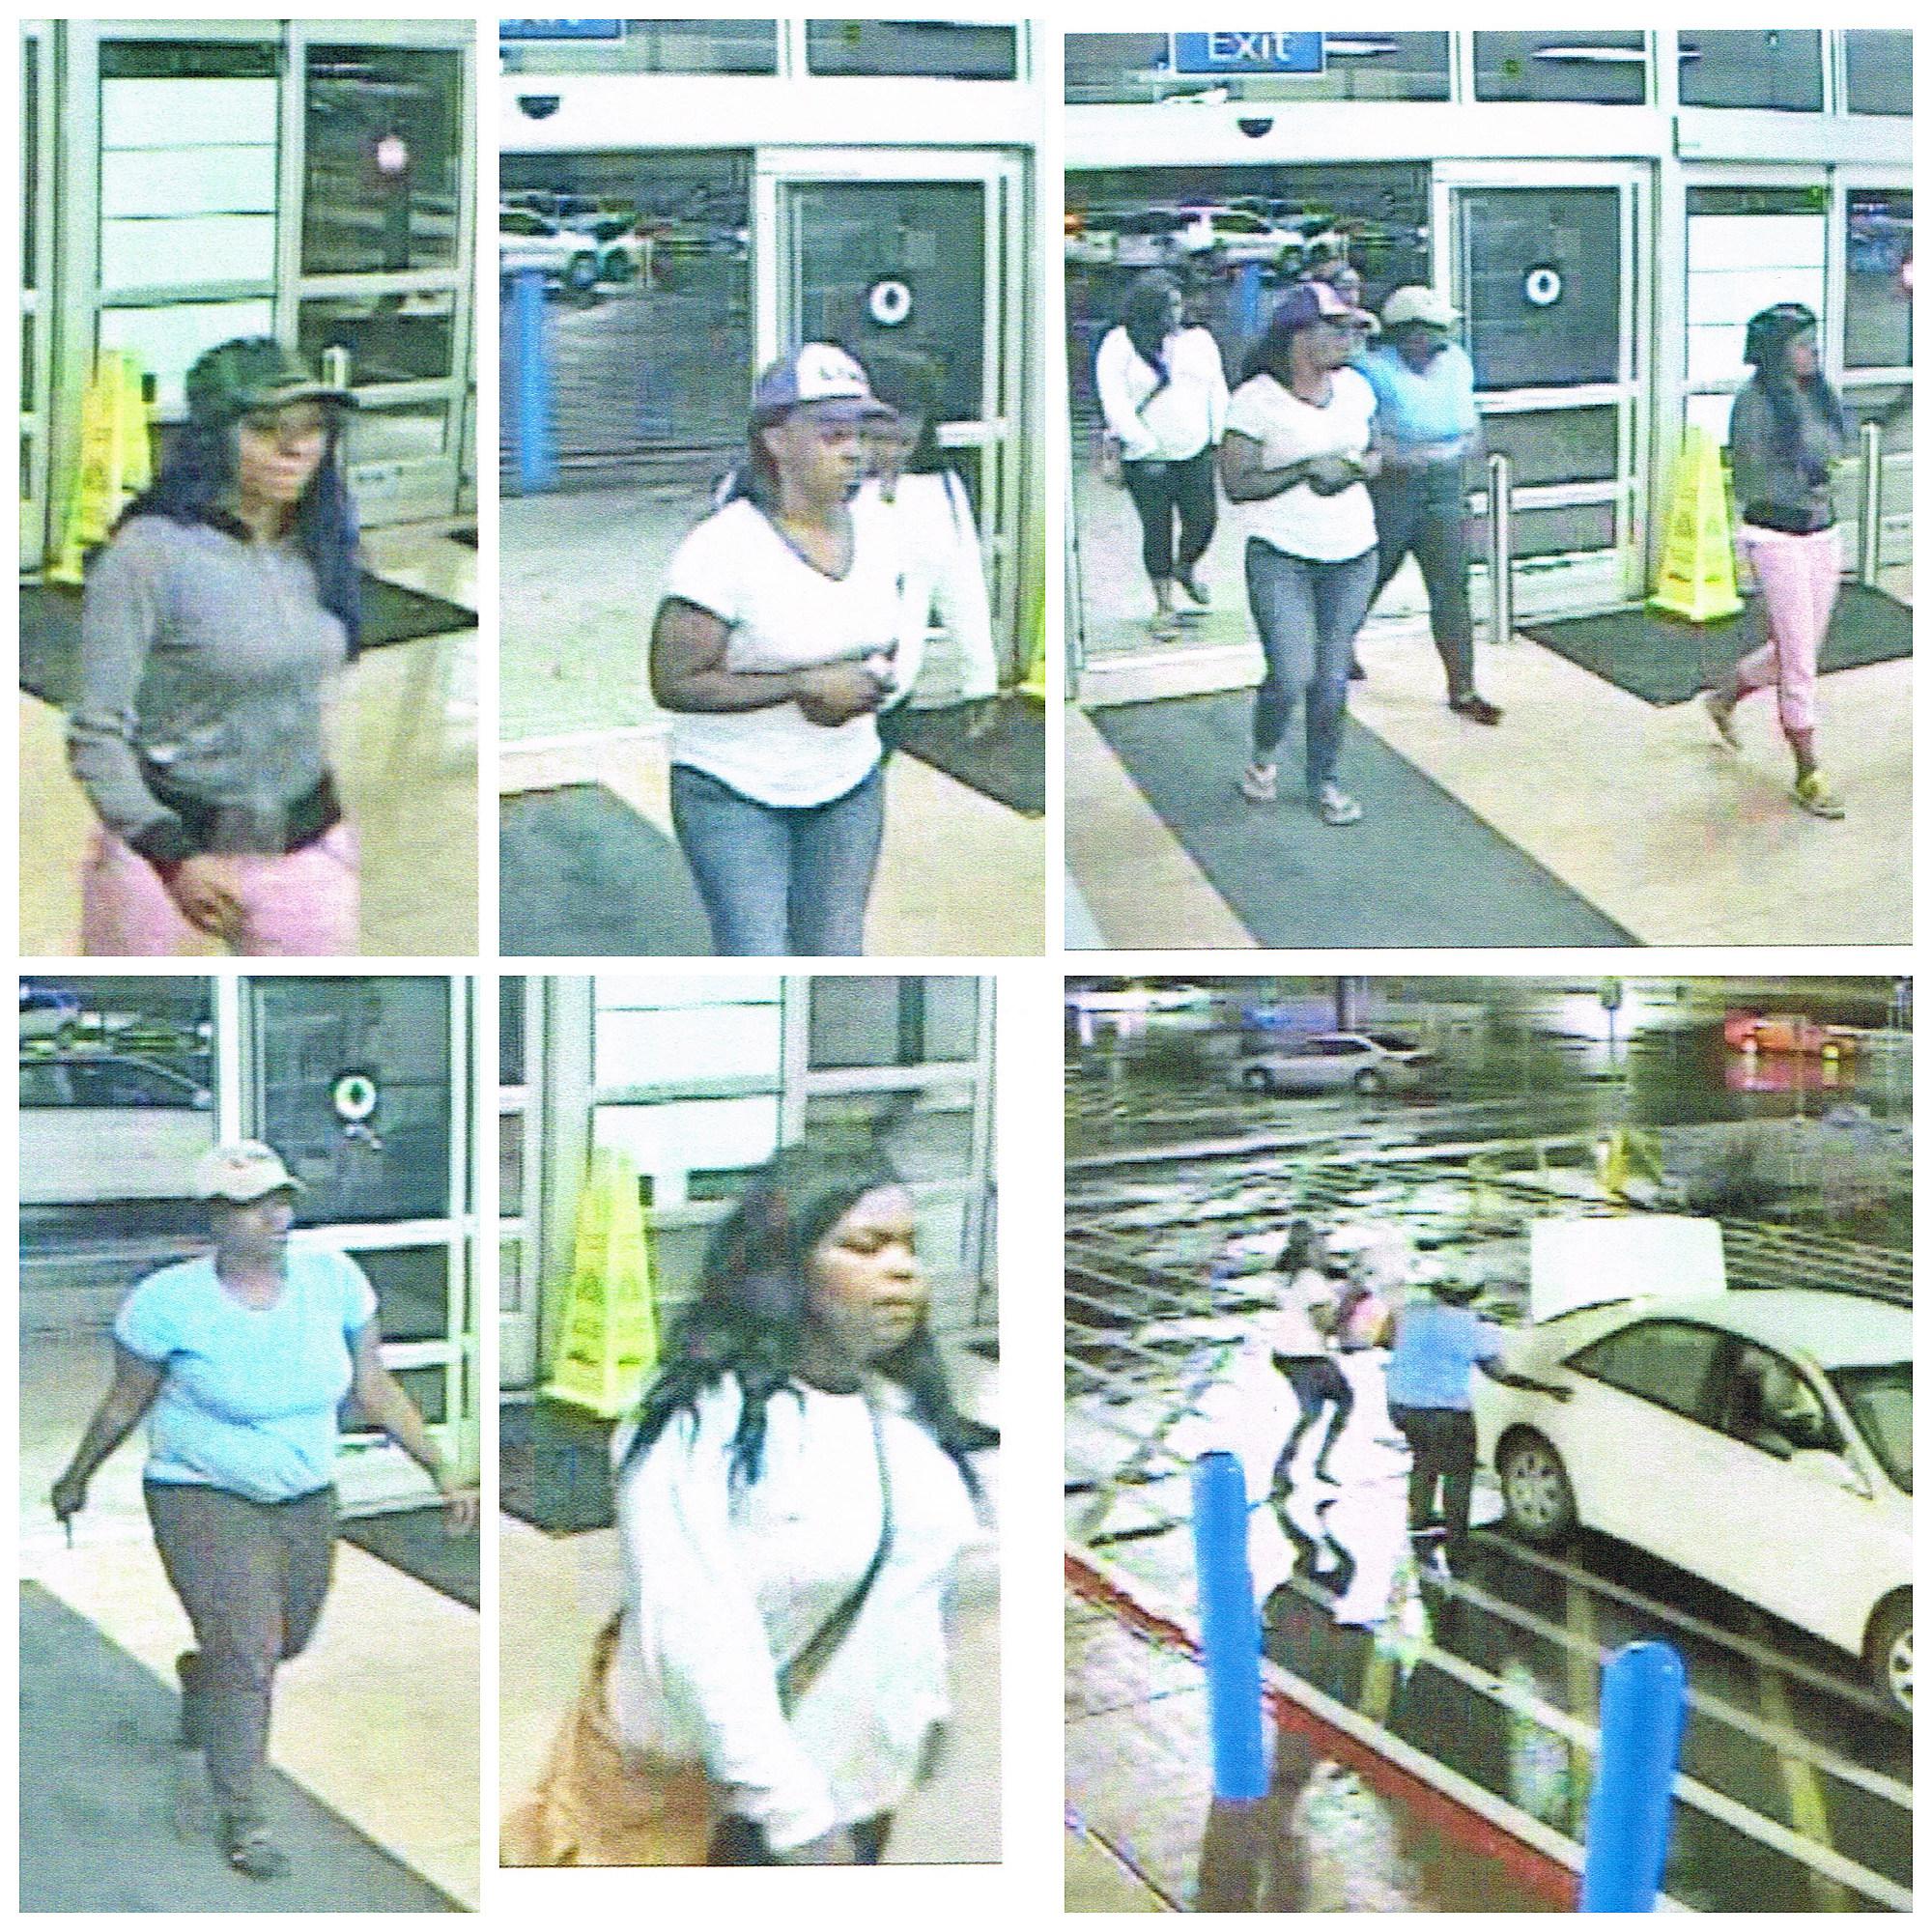 shoplifting suspects caught on walmart surveillance cameras